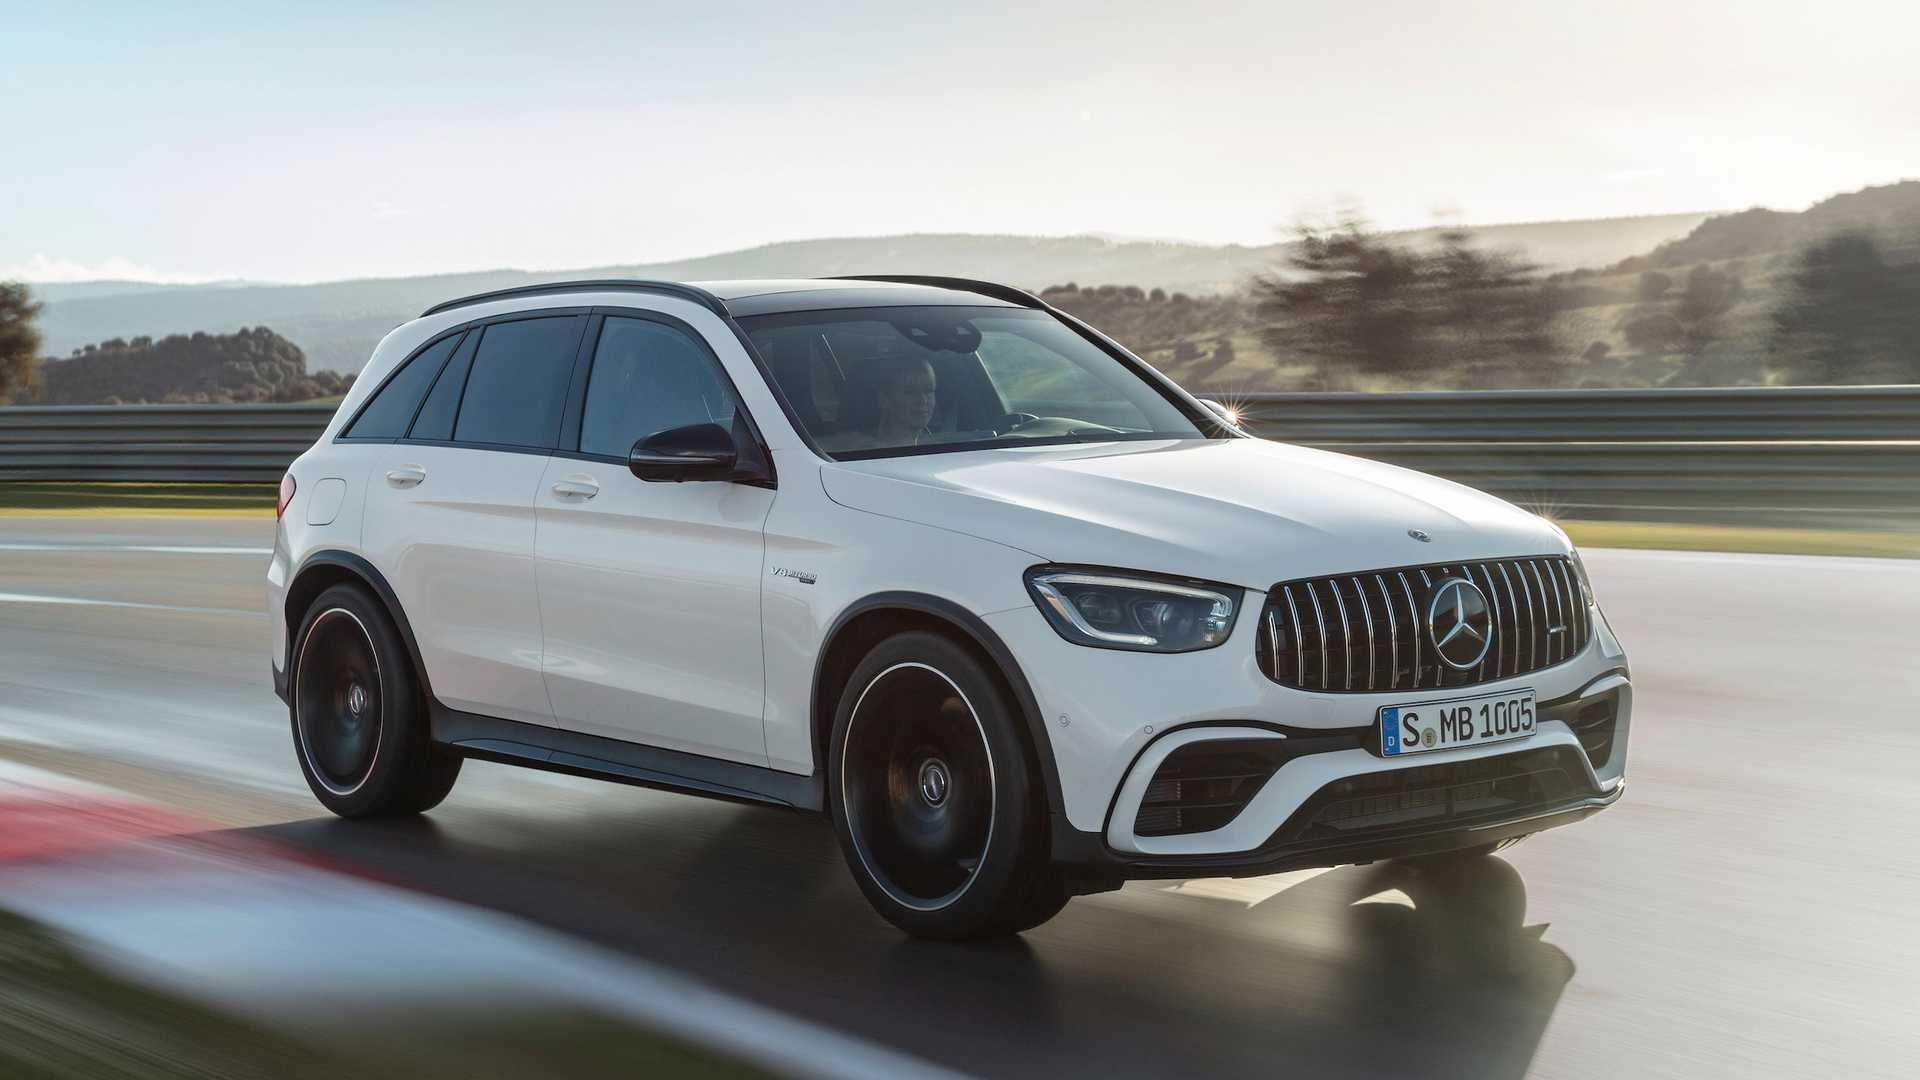 Mercedes-AMG GLC 63 S 2022 Stati Uniti